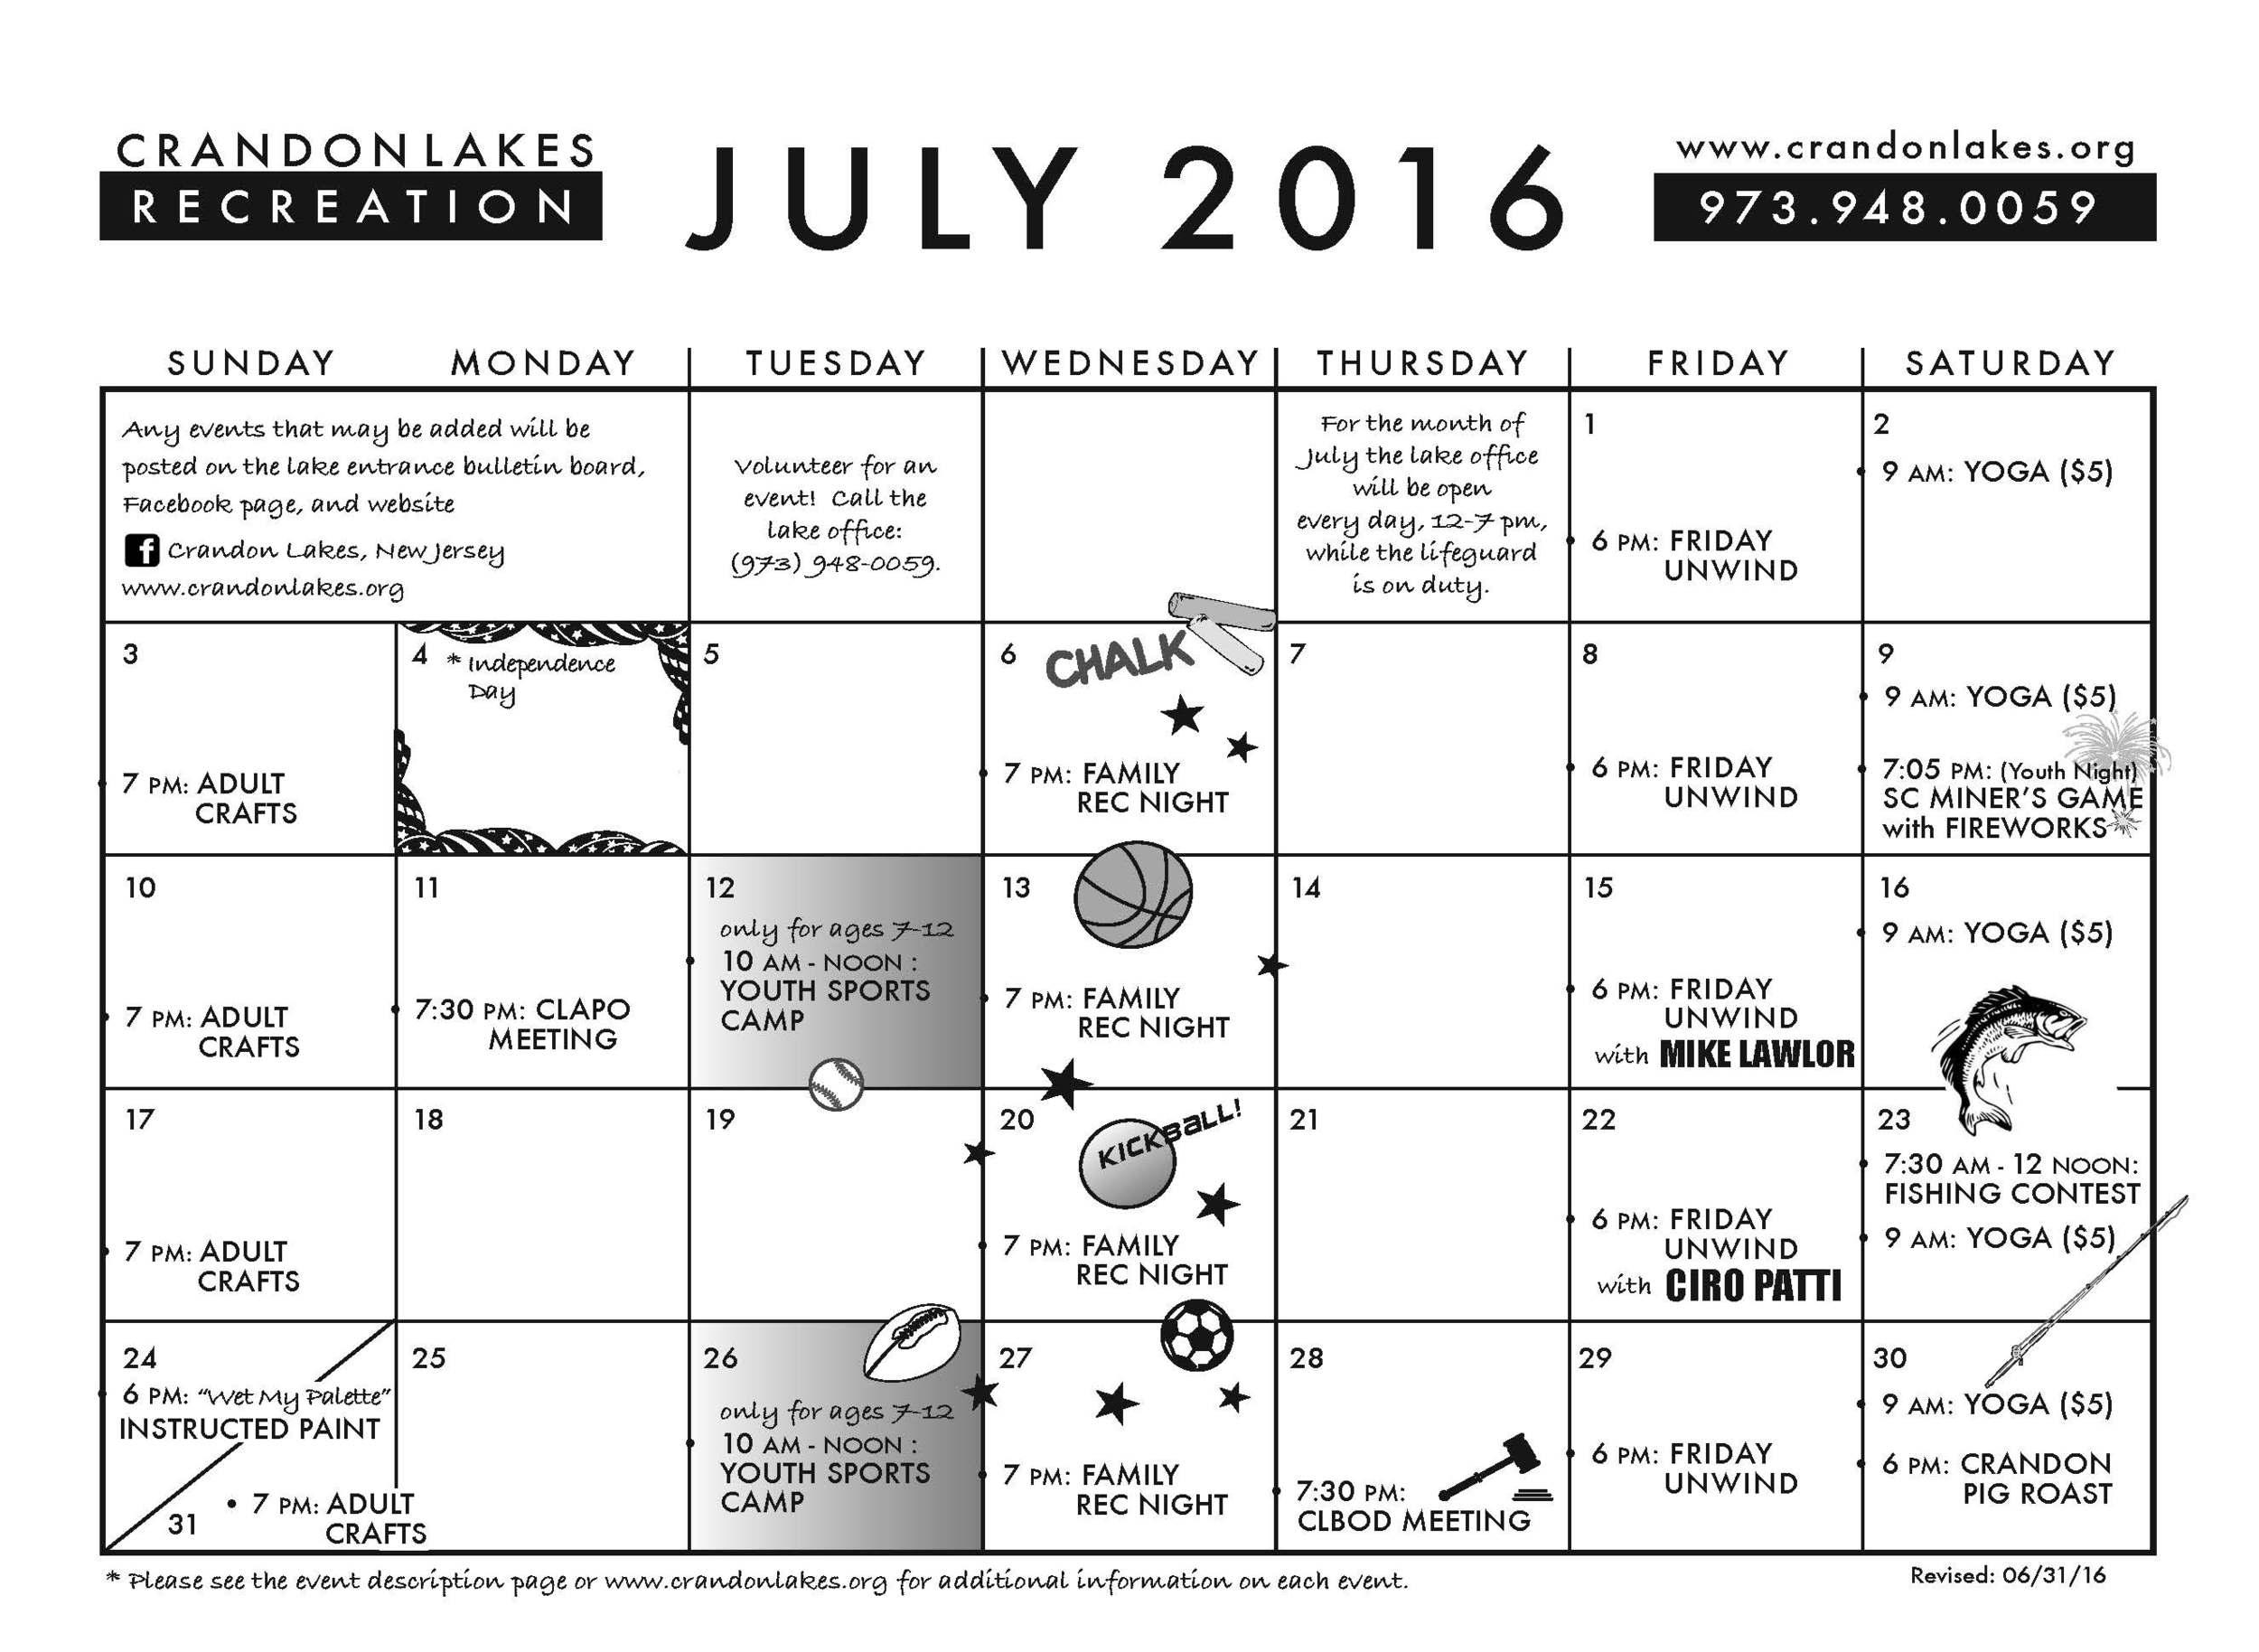 July 2016 Crandon Lakes Recreation Calendar